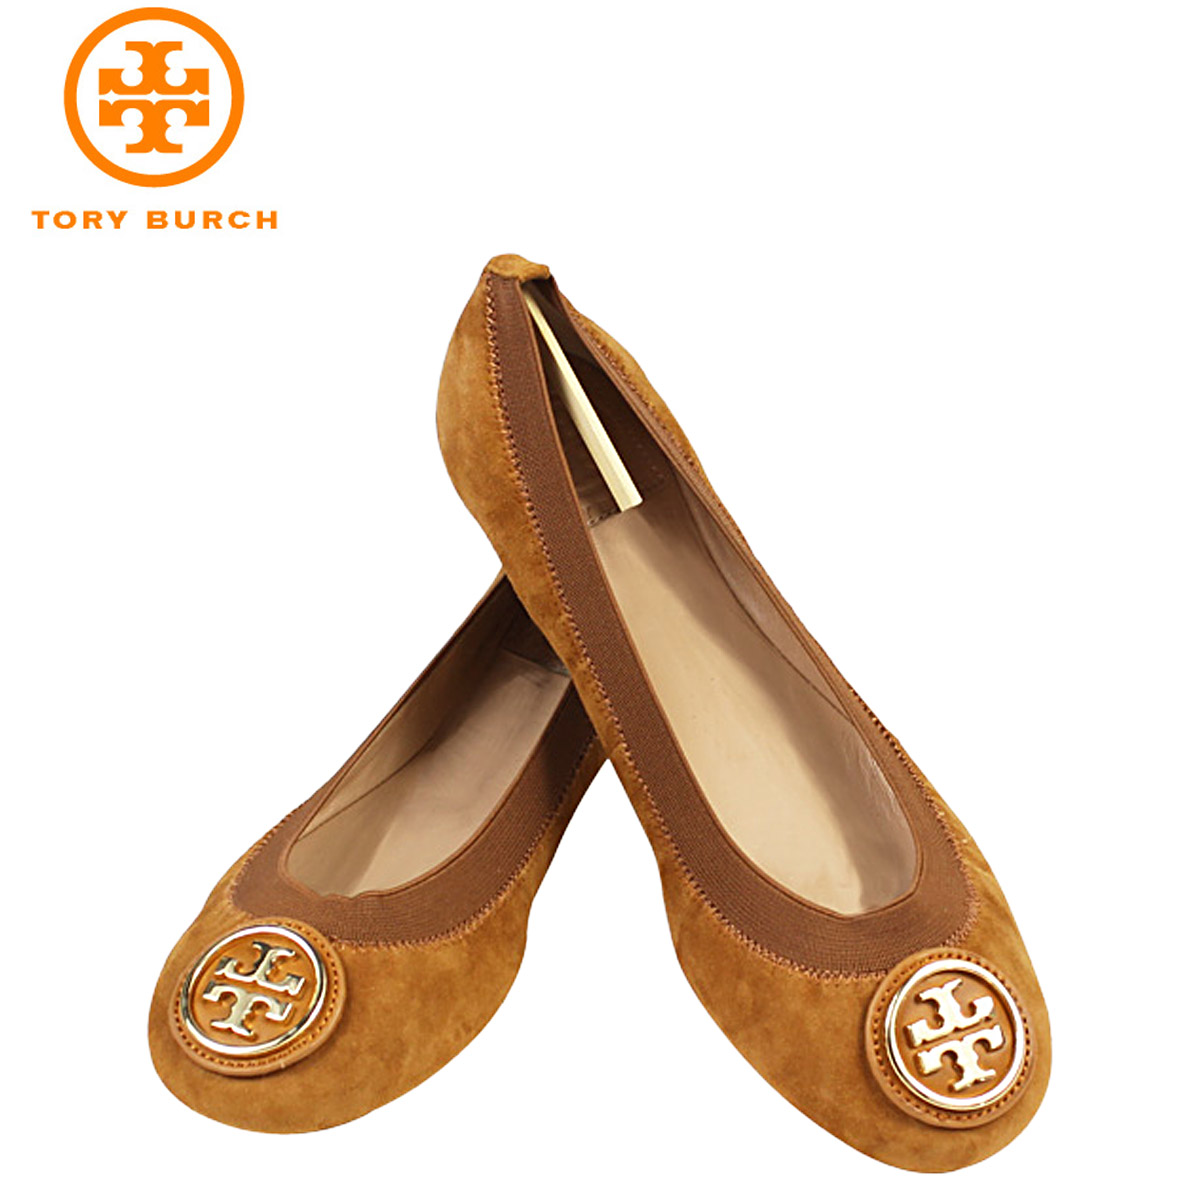 ALLSPORTS | Rakuten Global Market: Tory Burch TORY BURCH Womens Caroline  Ballet flat pumps CAROLINE BALLET FLAT suede ballet shoes 31148201 228  Maple suede ...